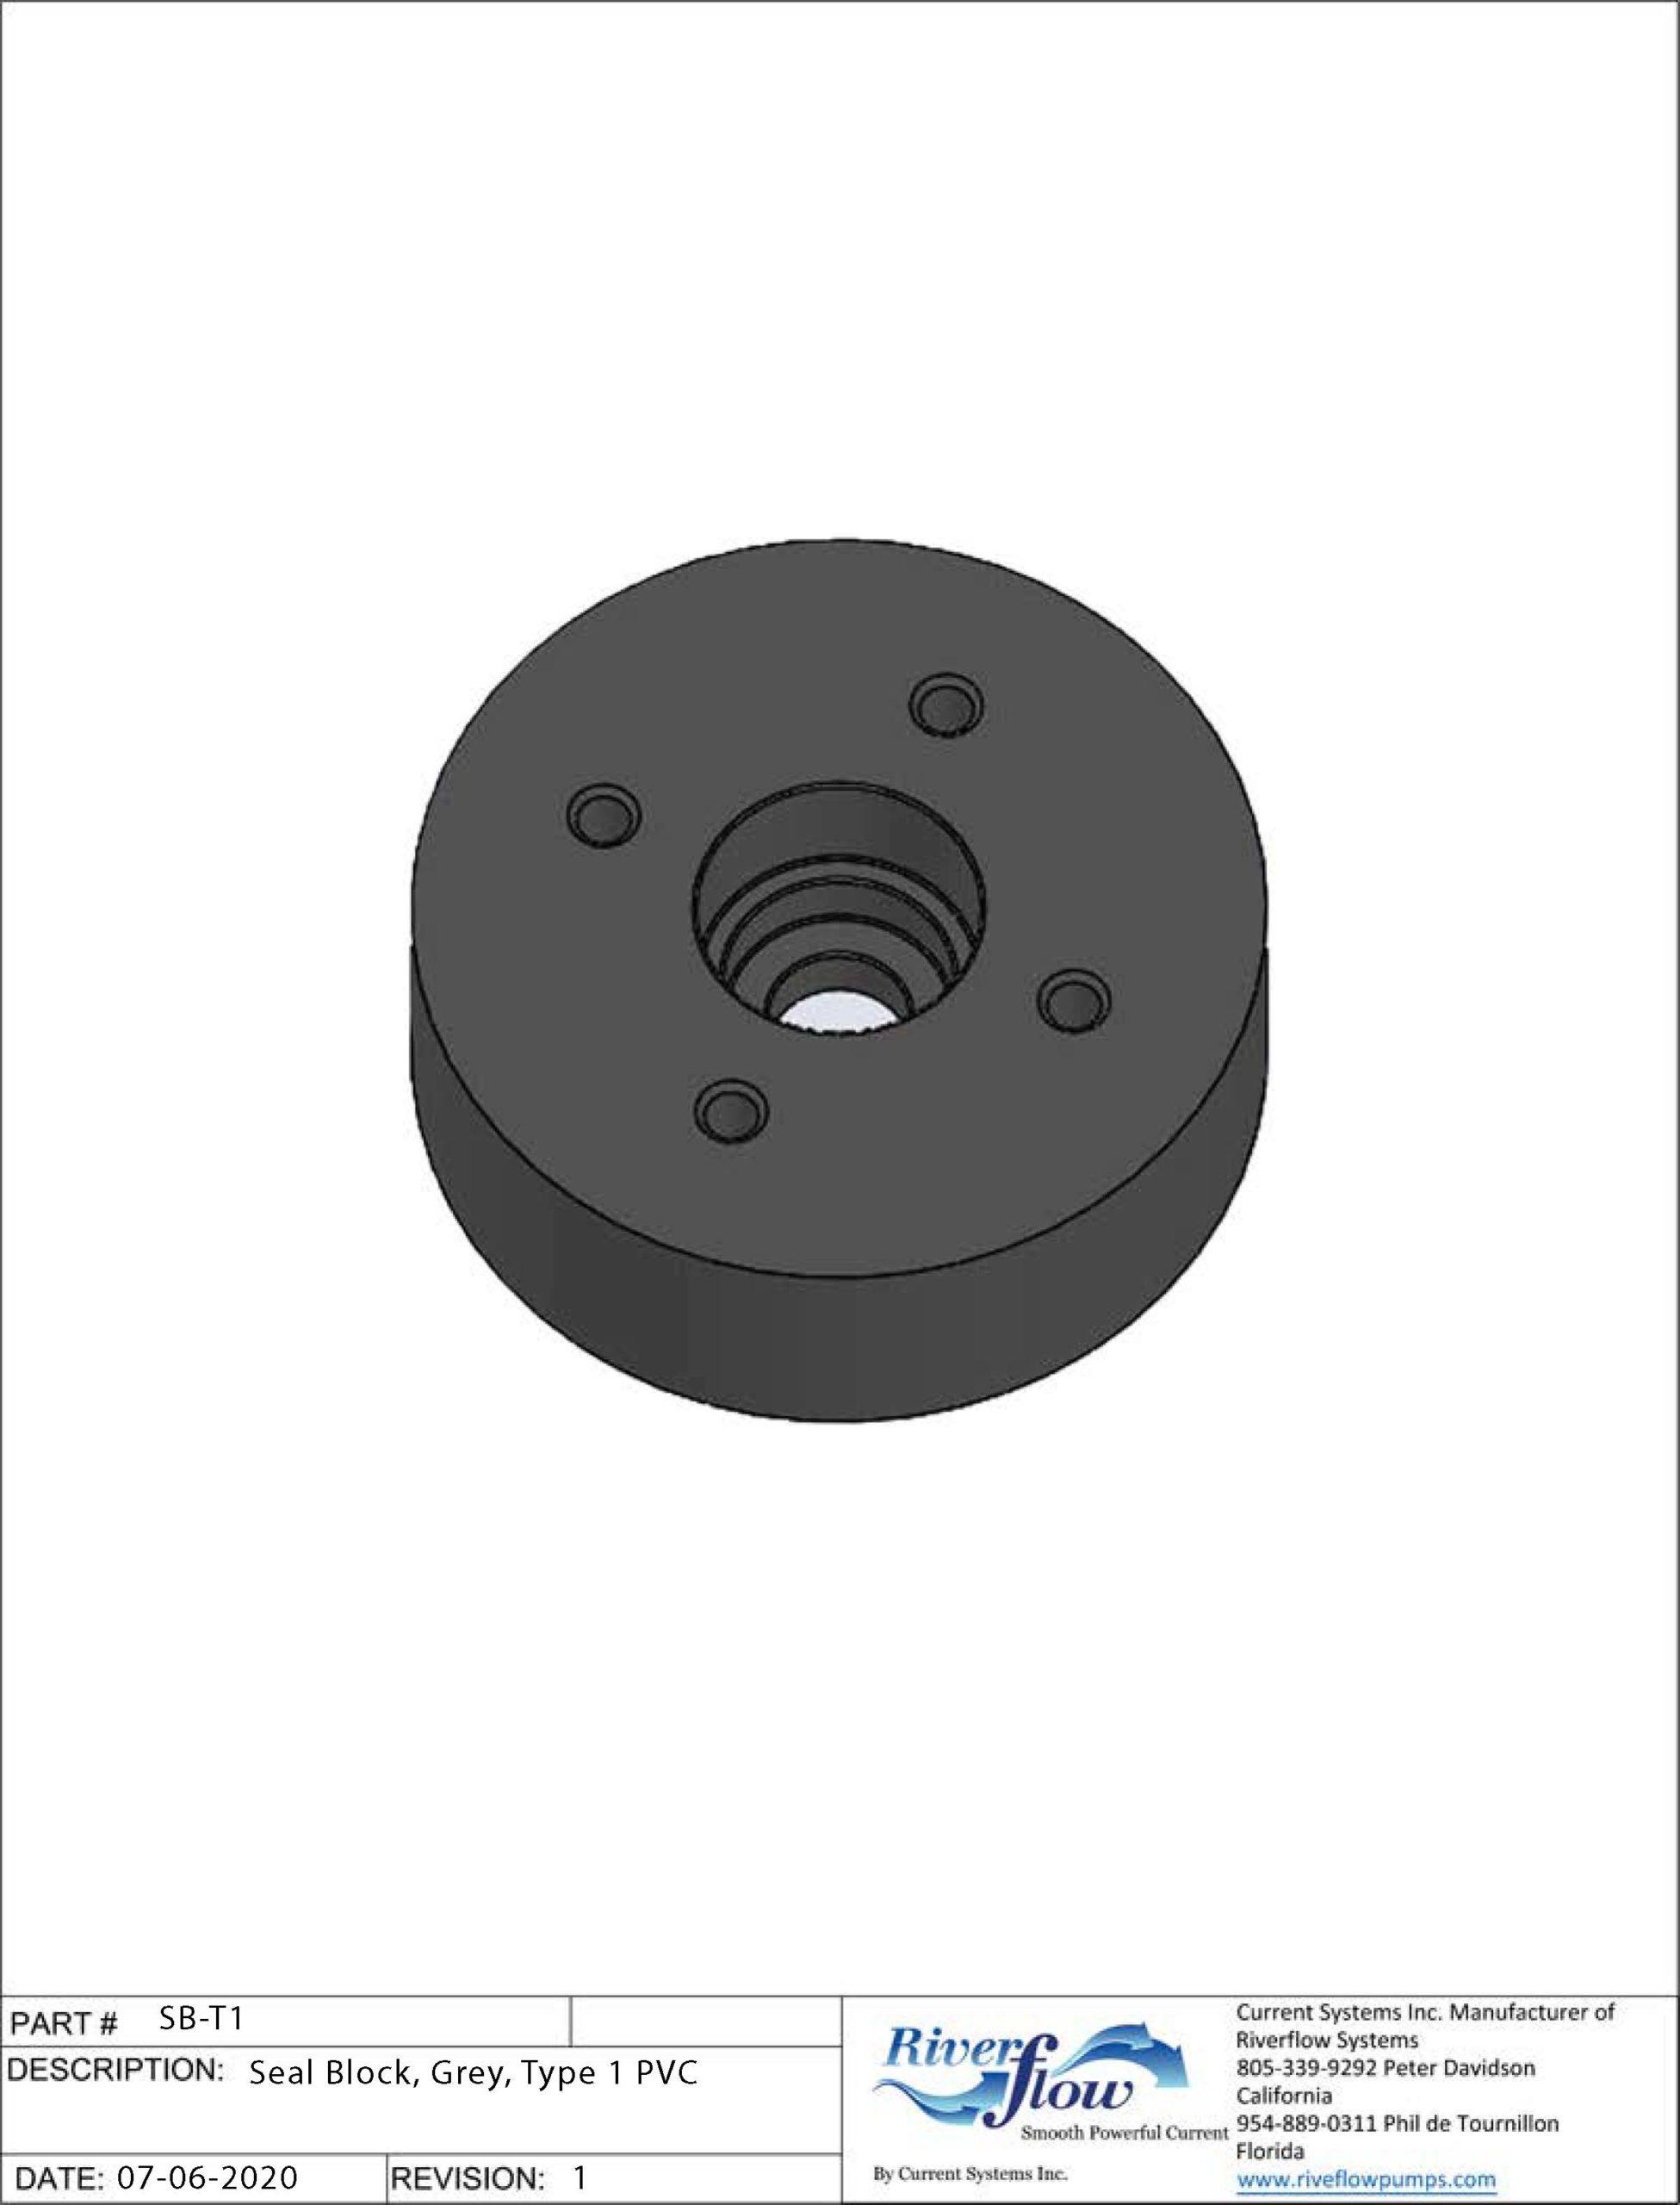 PN#: SB-T1  Seal Block, Grey, Type 1 PVC